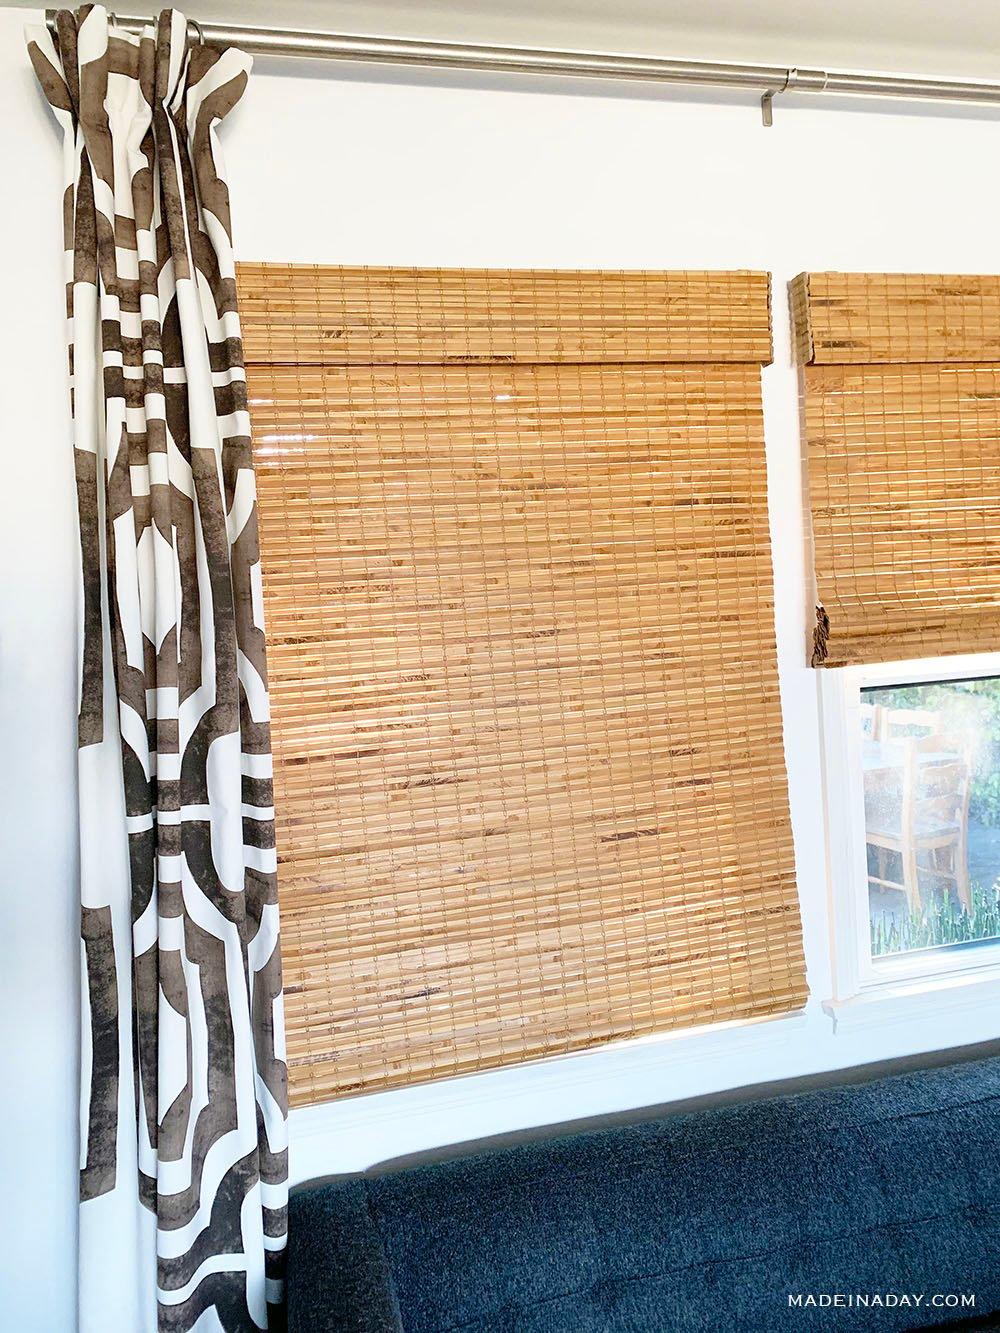 Hatteras Bamboo Blinds, Cordless bamboo blinds,